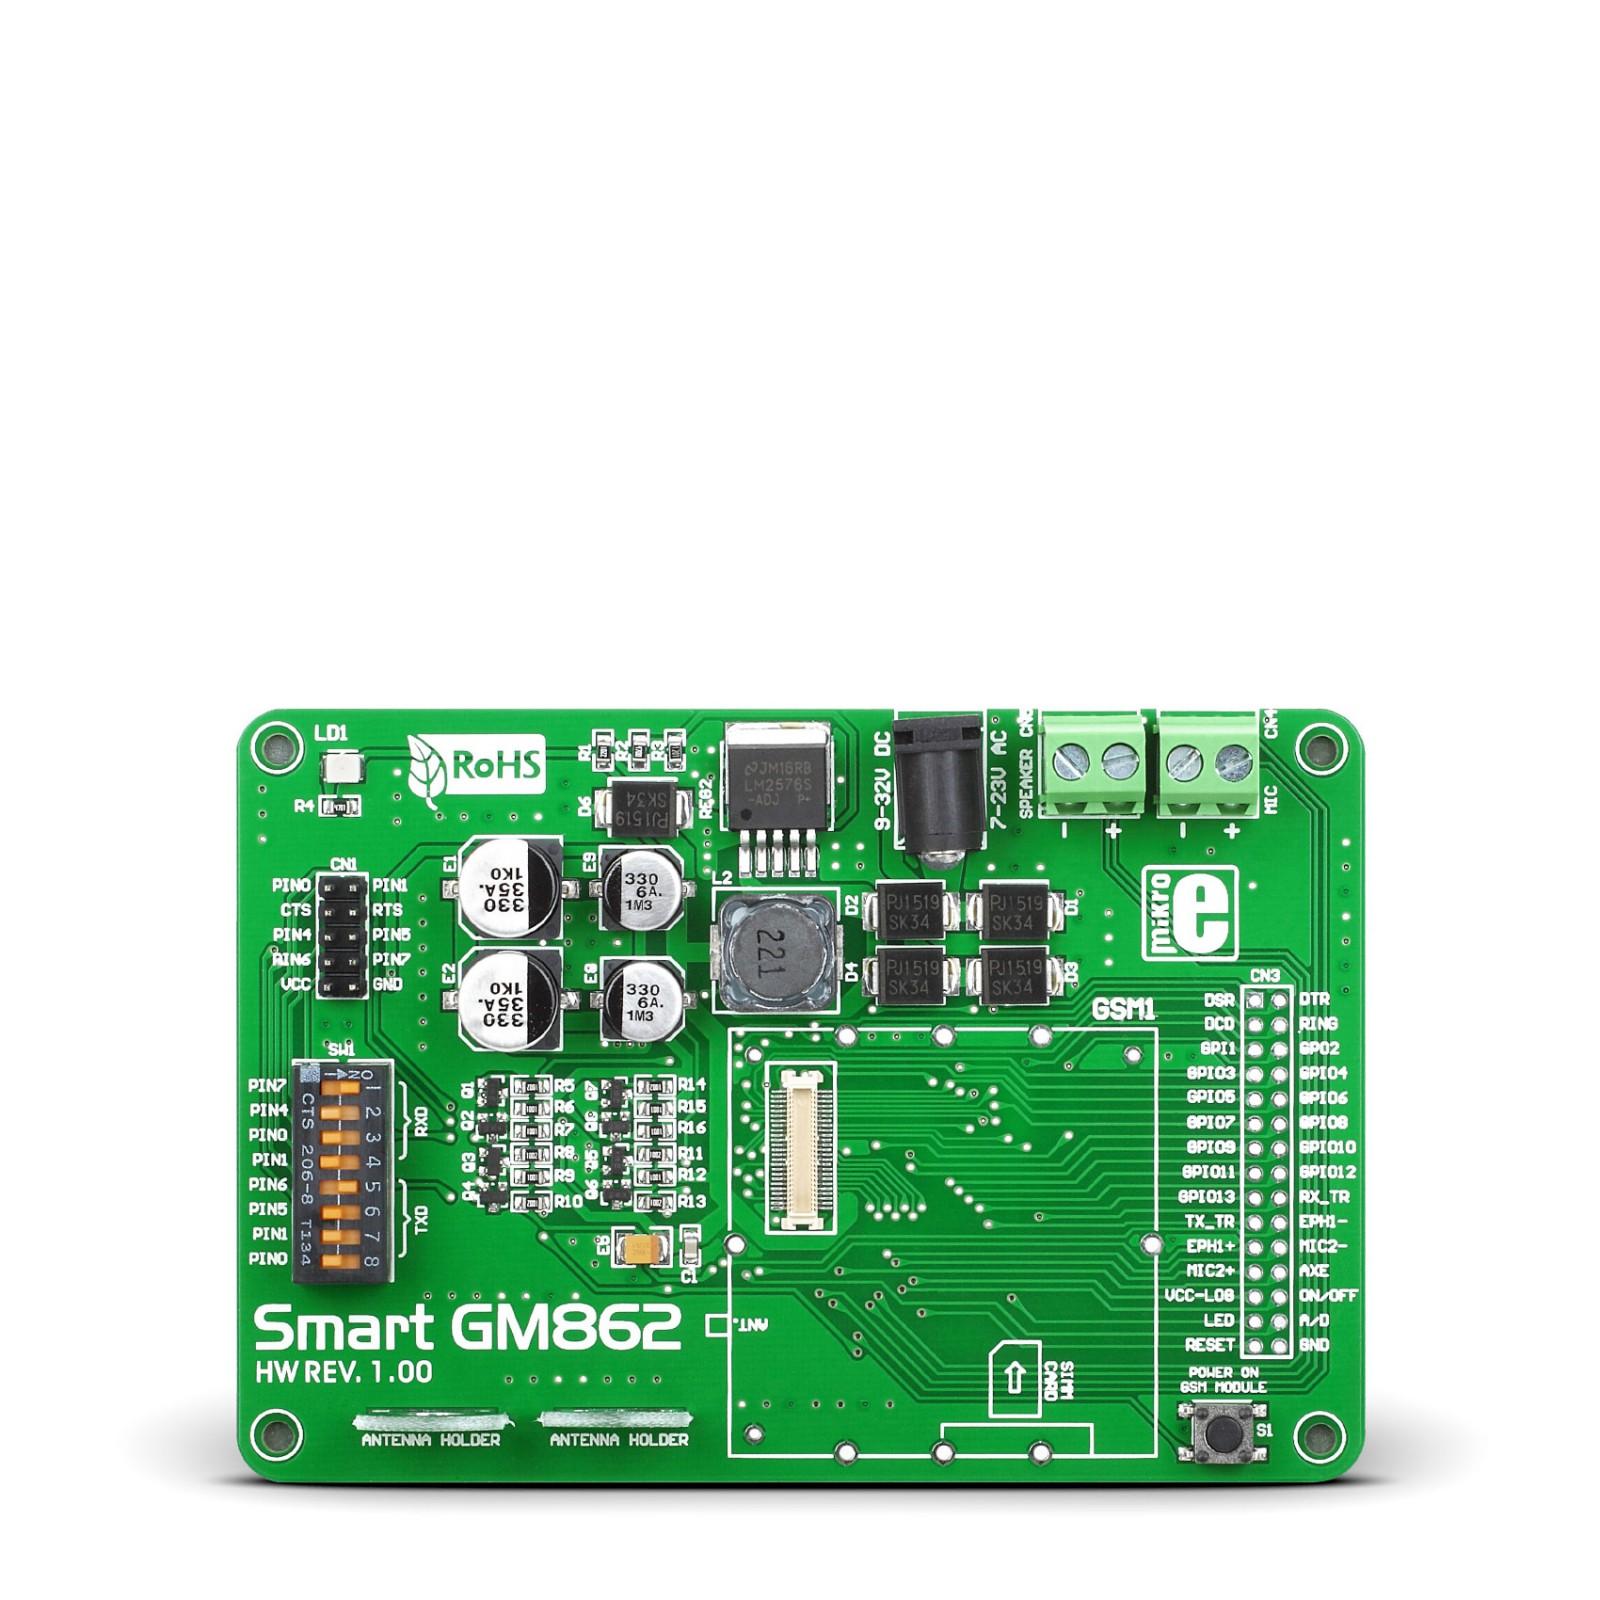 Smartgm862 Board Telit Gm862 Gsm Gprs Development Tool Copyright Of This Circuit Belongs To Smart Kit Electronics In Mgctlbxnmzp Mgctlbxv5112 Mgctlbxlc Mgctlbxpprestashop